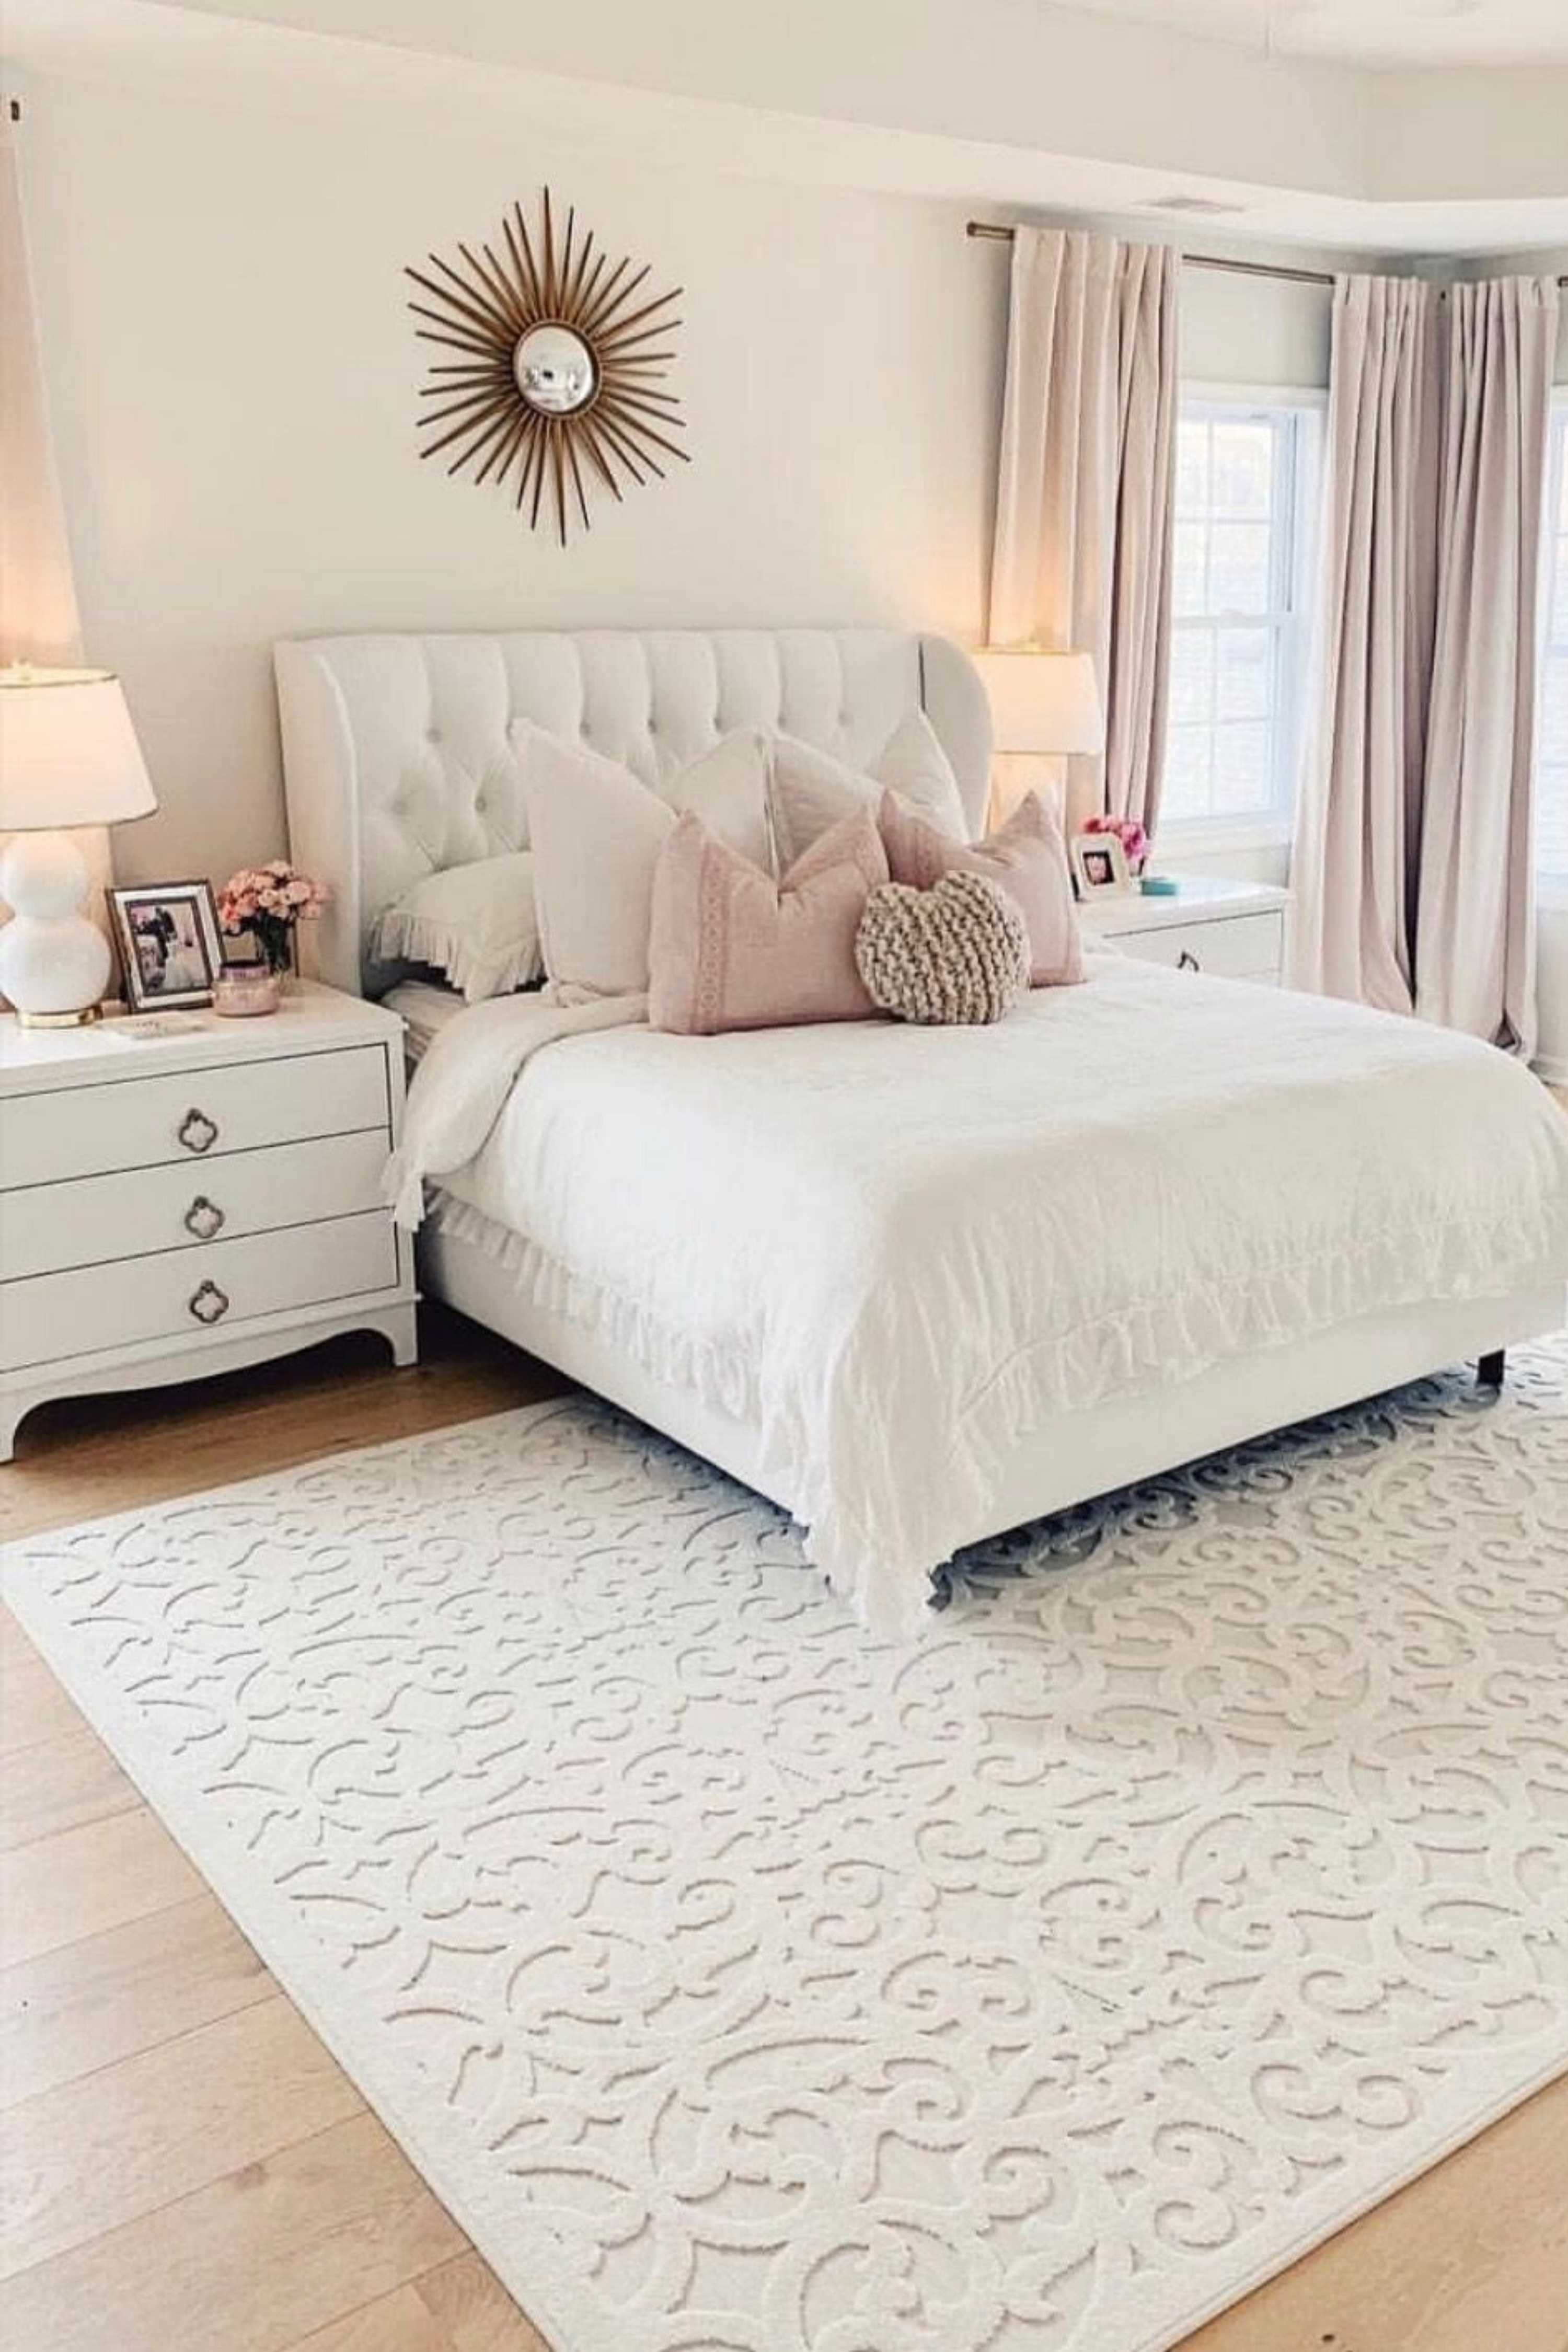 bedroom decor stores near me #bedroom decor luxury #bedroom